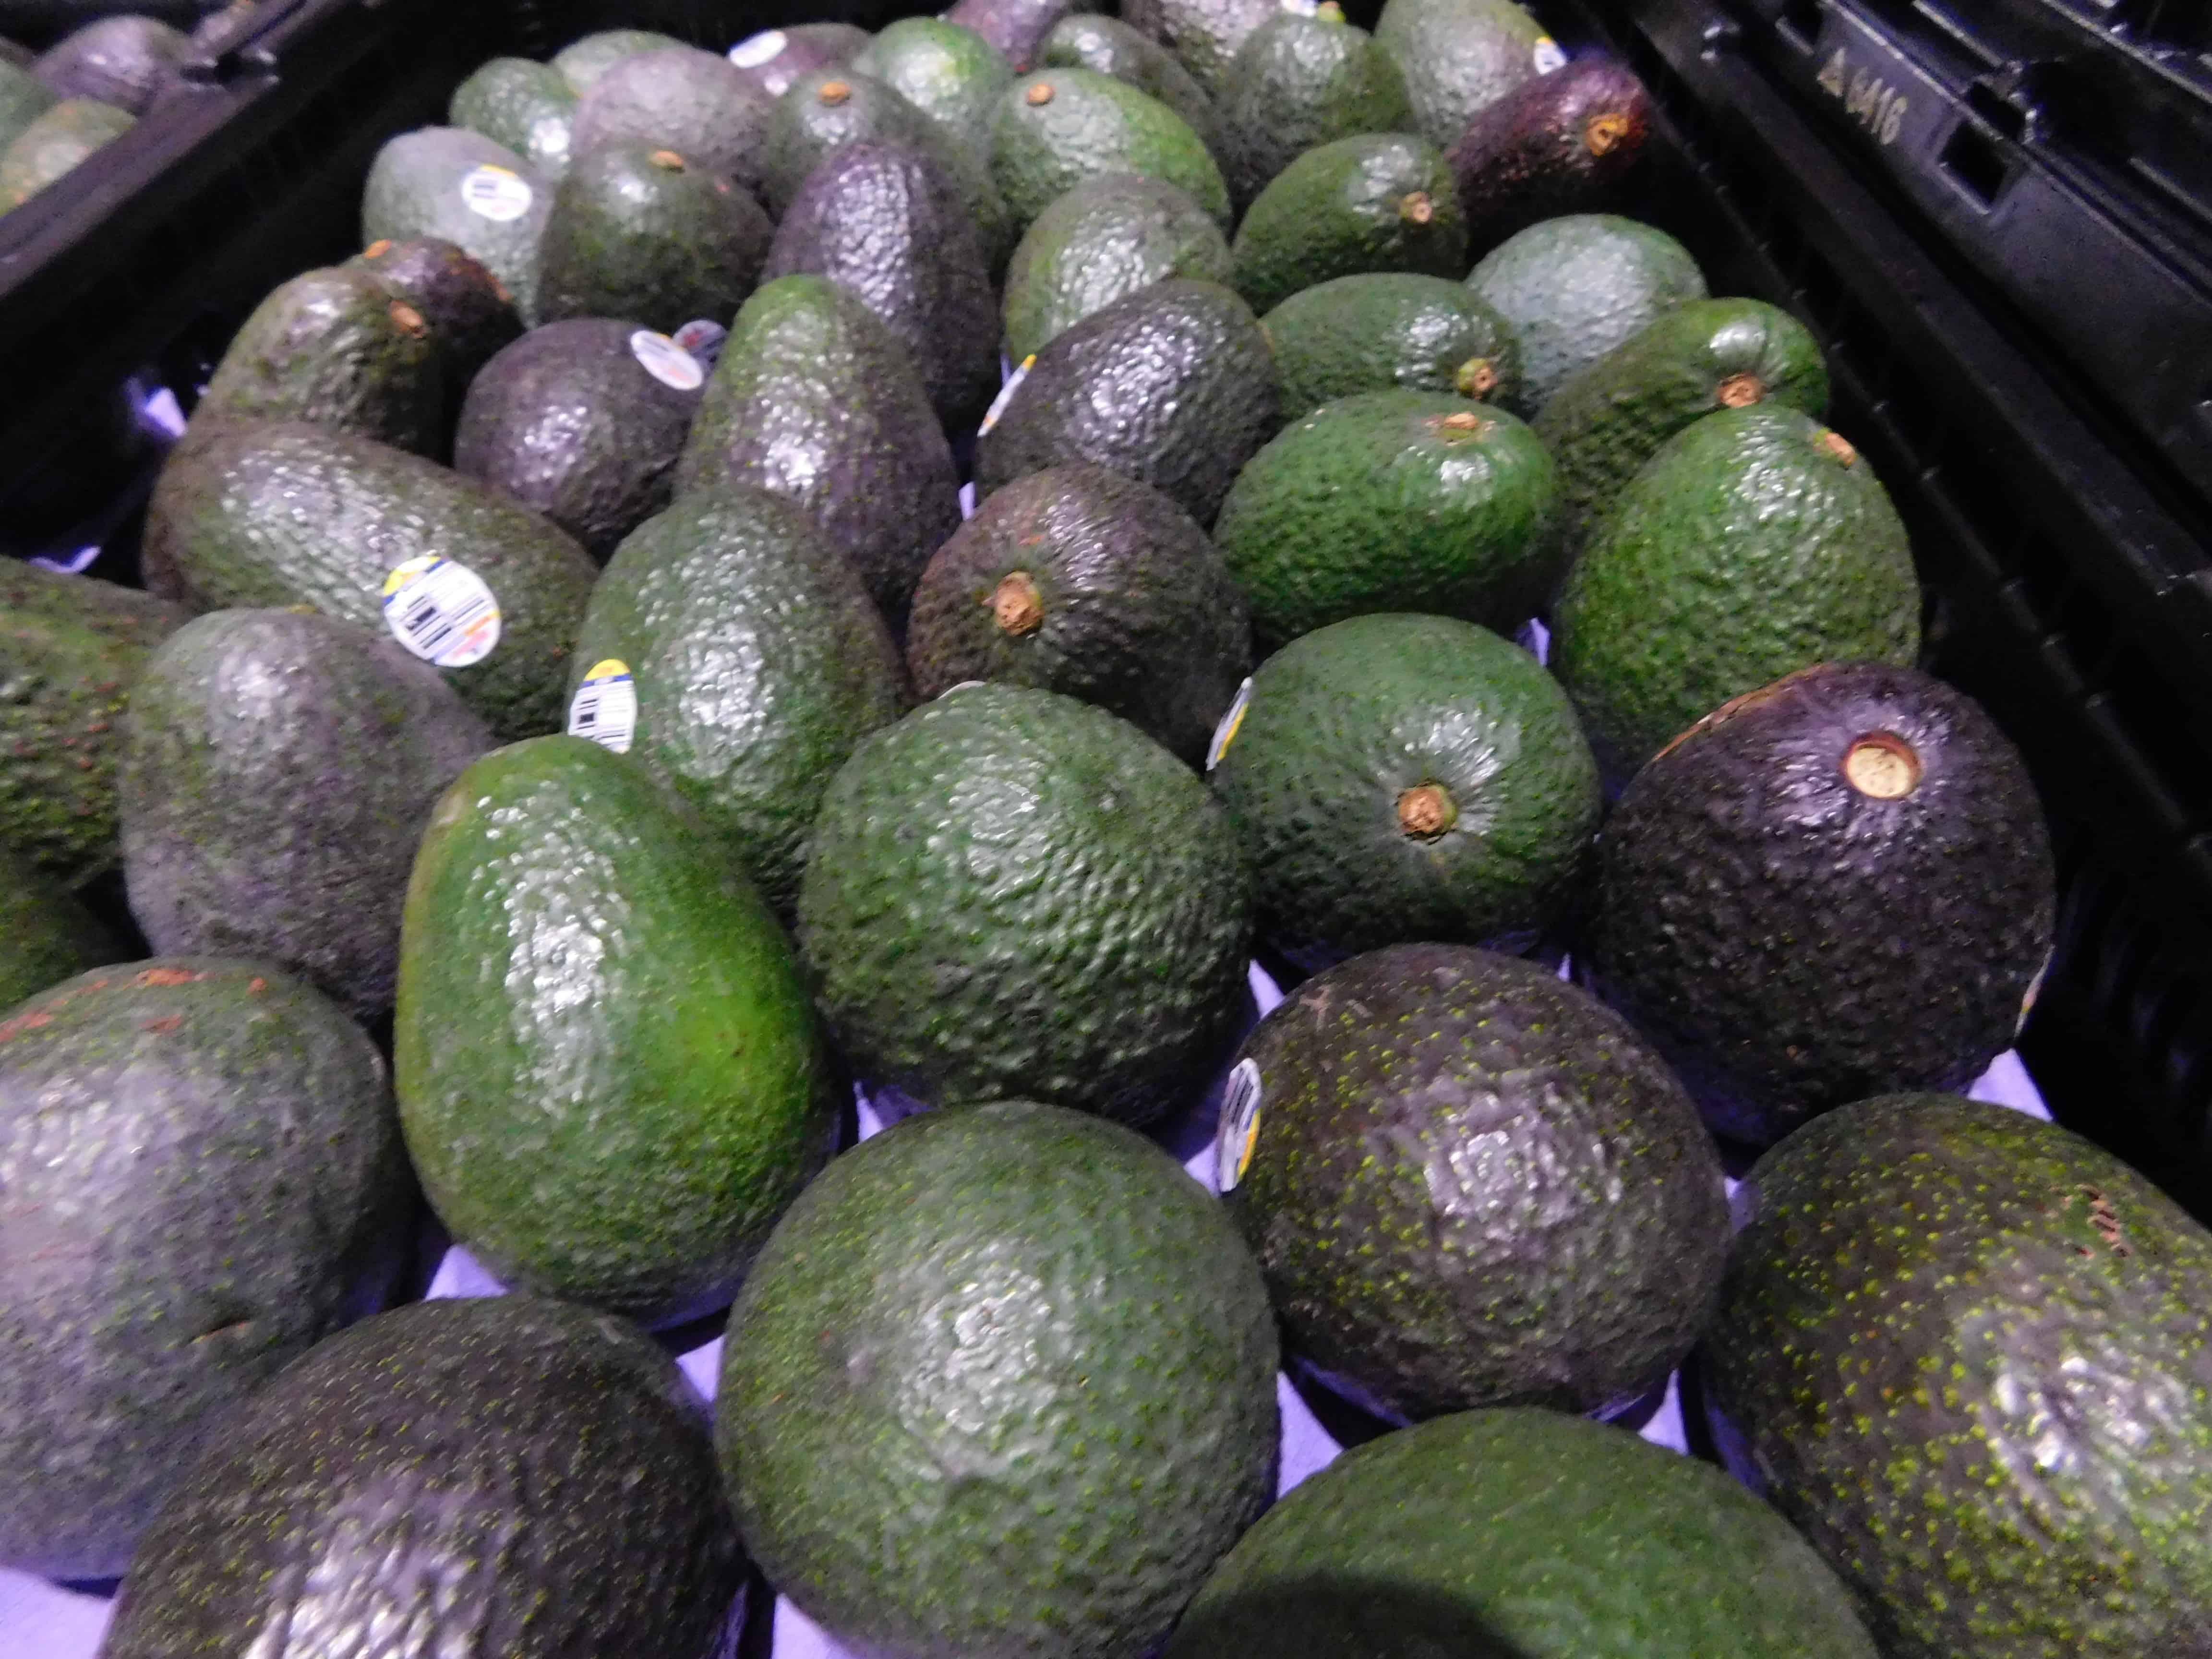 Avocado Harvest Amp Packing The Produce Nerd